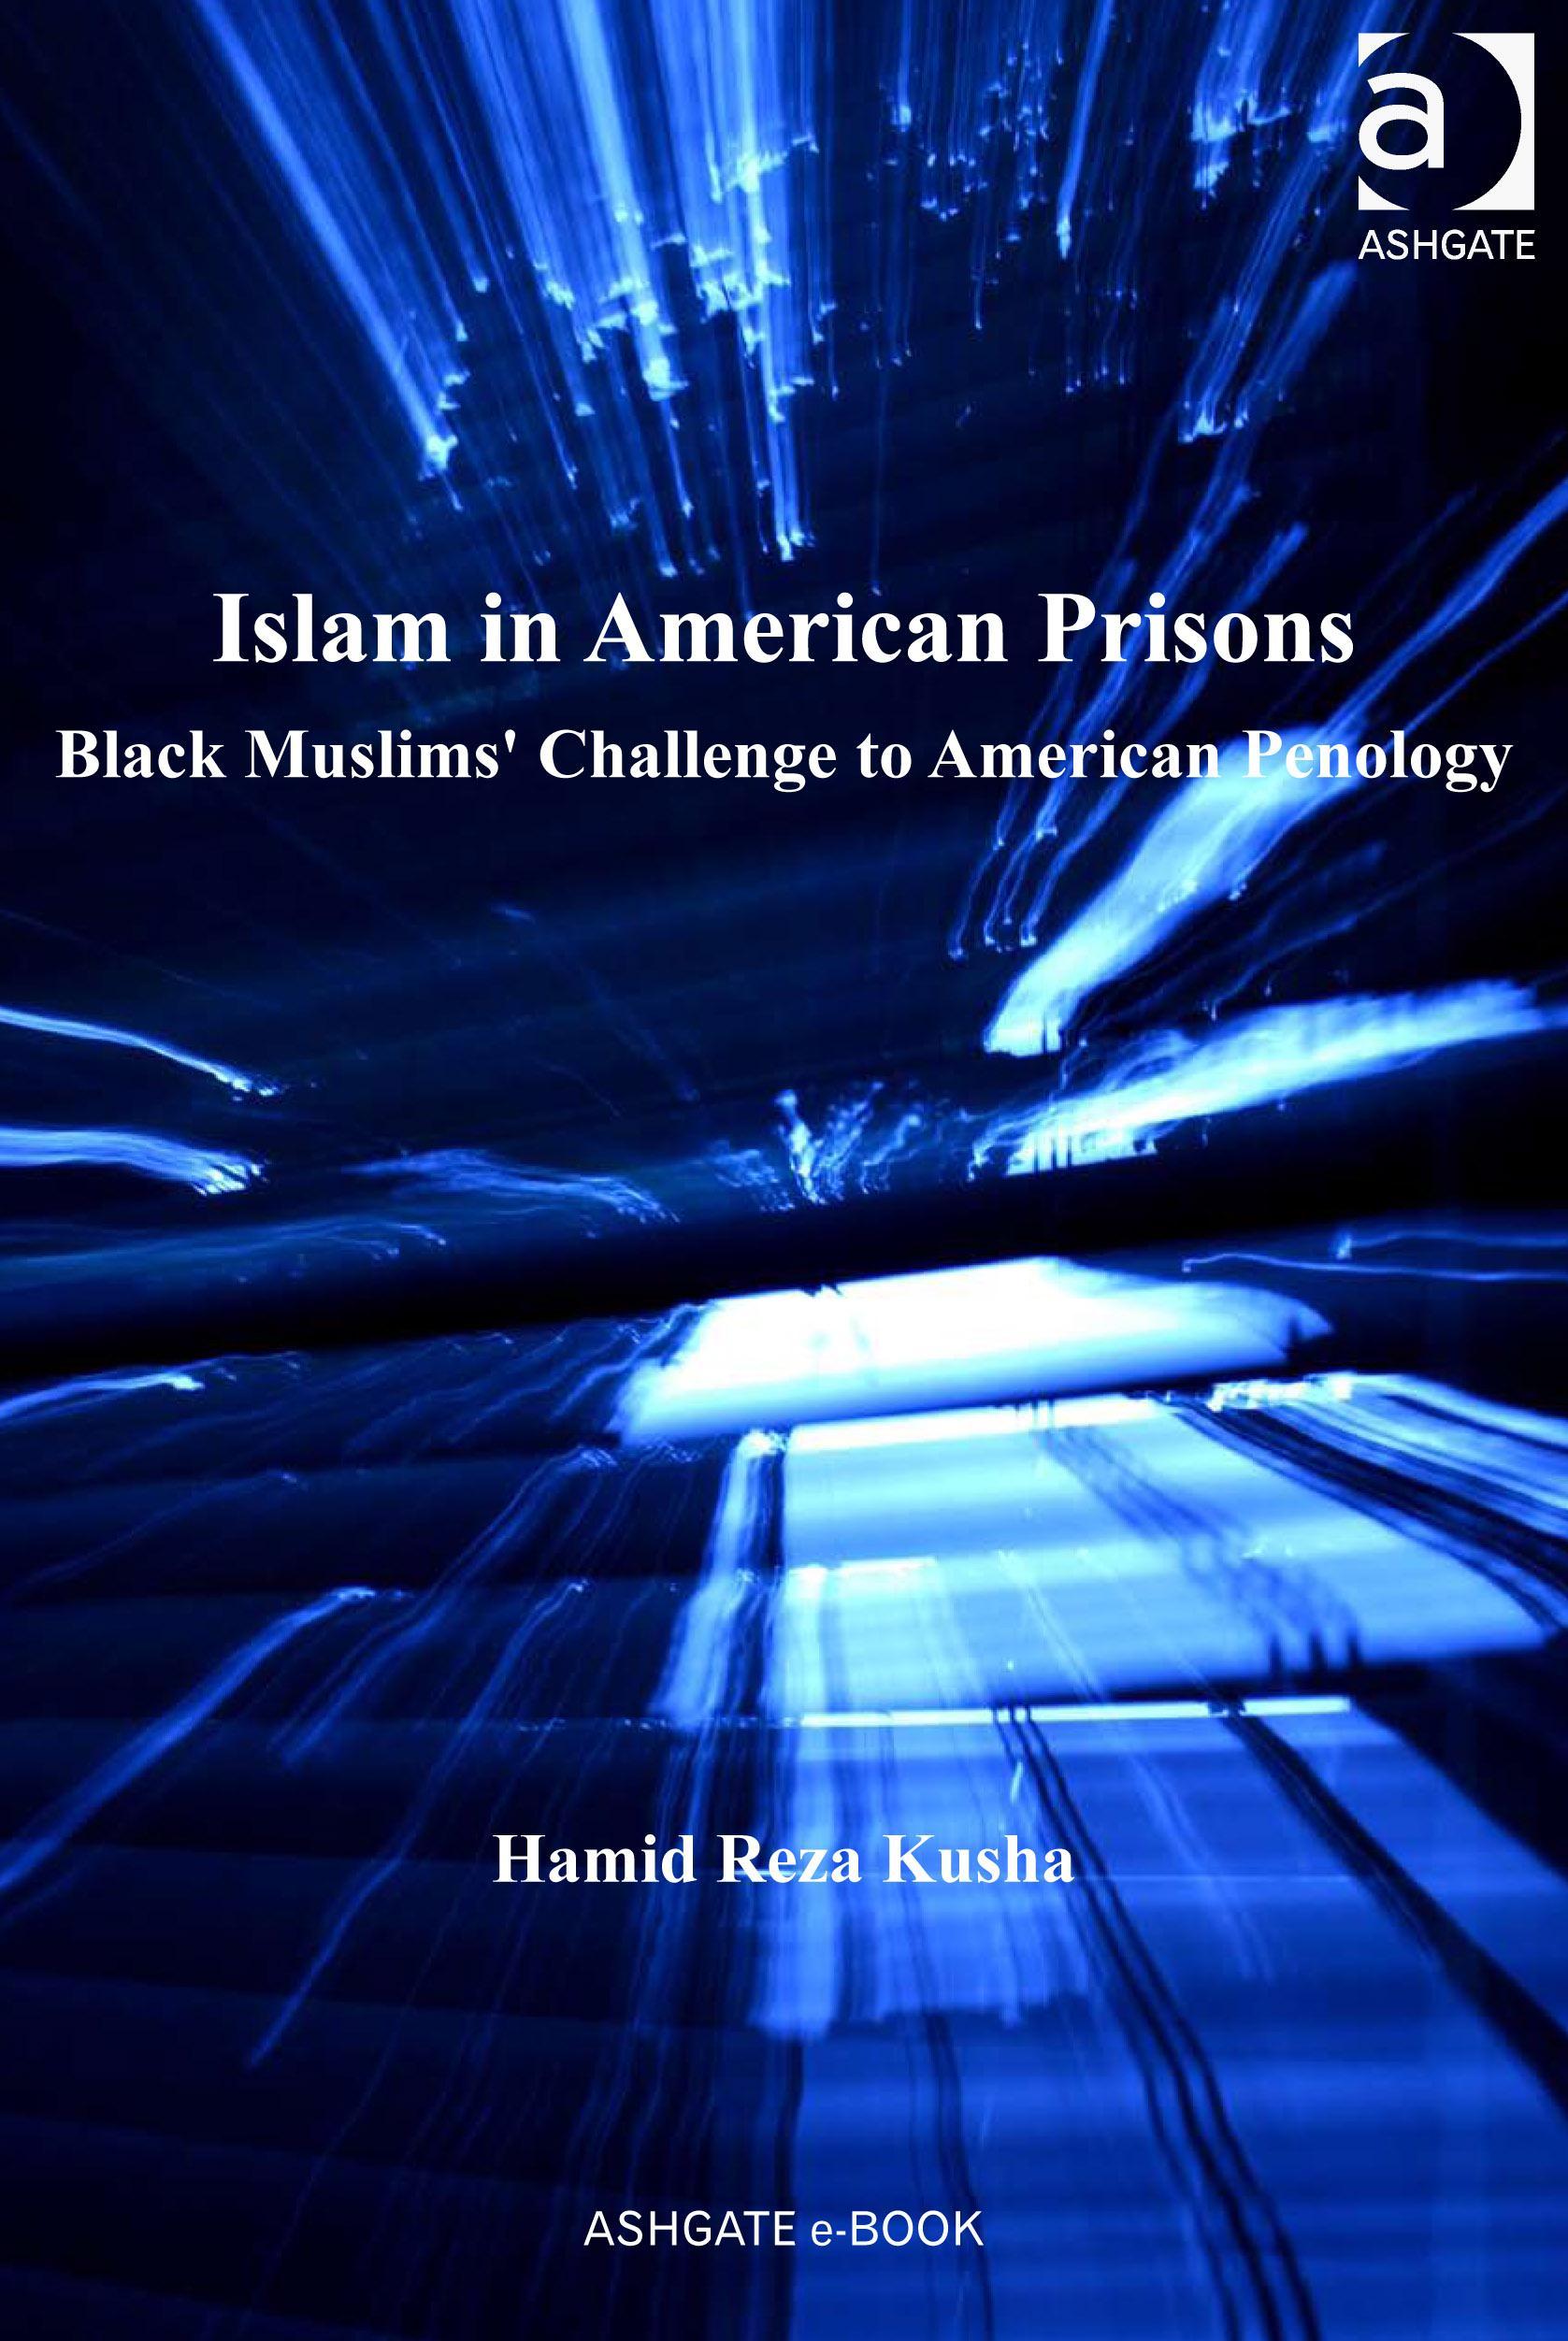 Islam in American Prisons: Black Muslims' Challenge to American Penology EB9780754688655